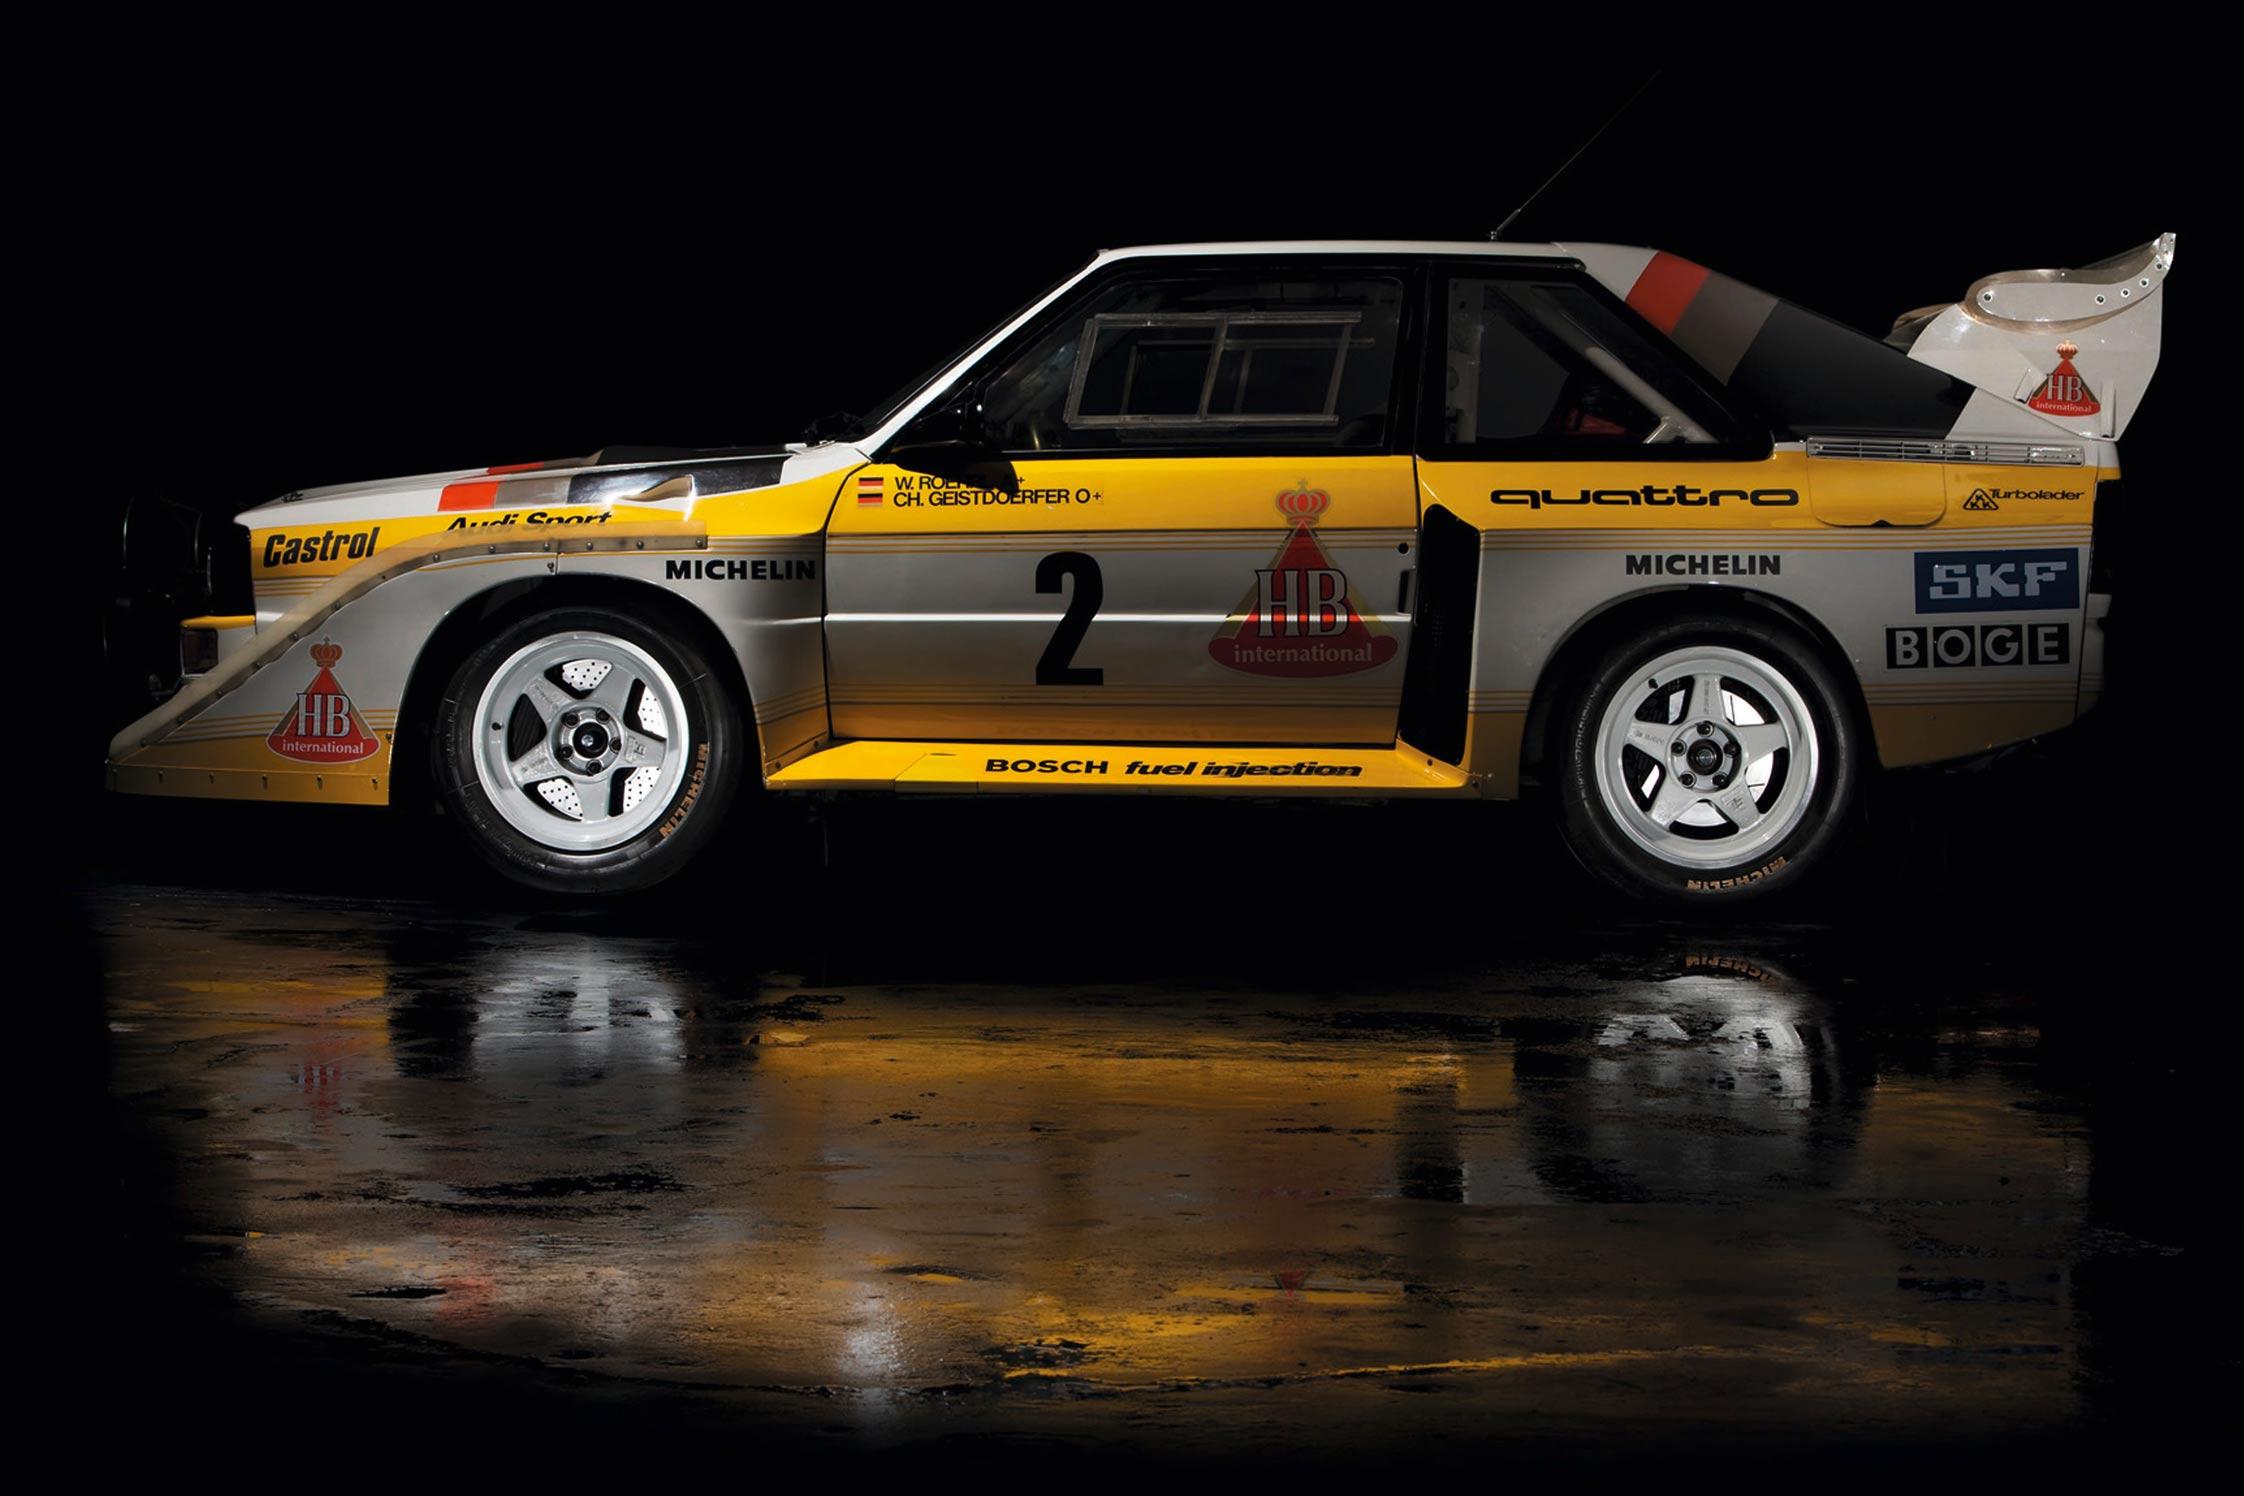 1985 sport quattro s1 en groupe b 500 ch audi quattro. Black Bedroom Furniture Sets. Home Design Ideas